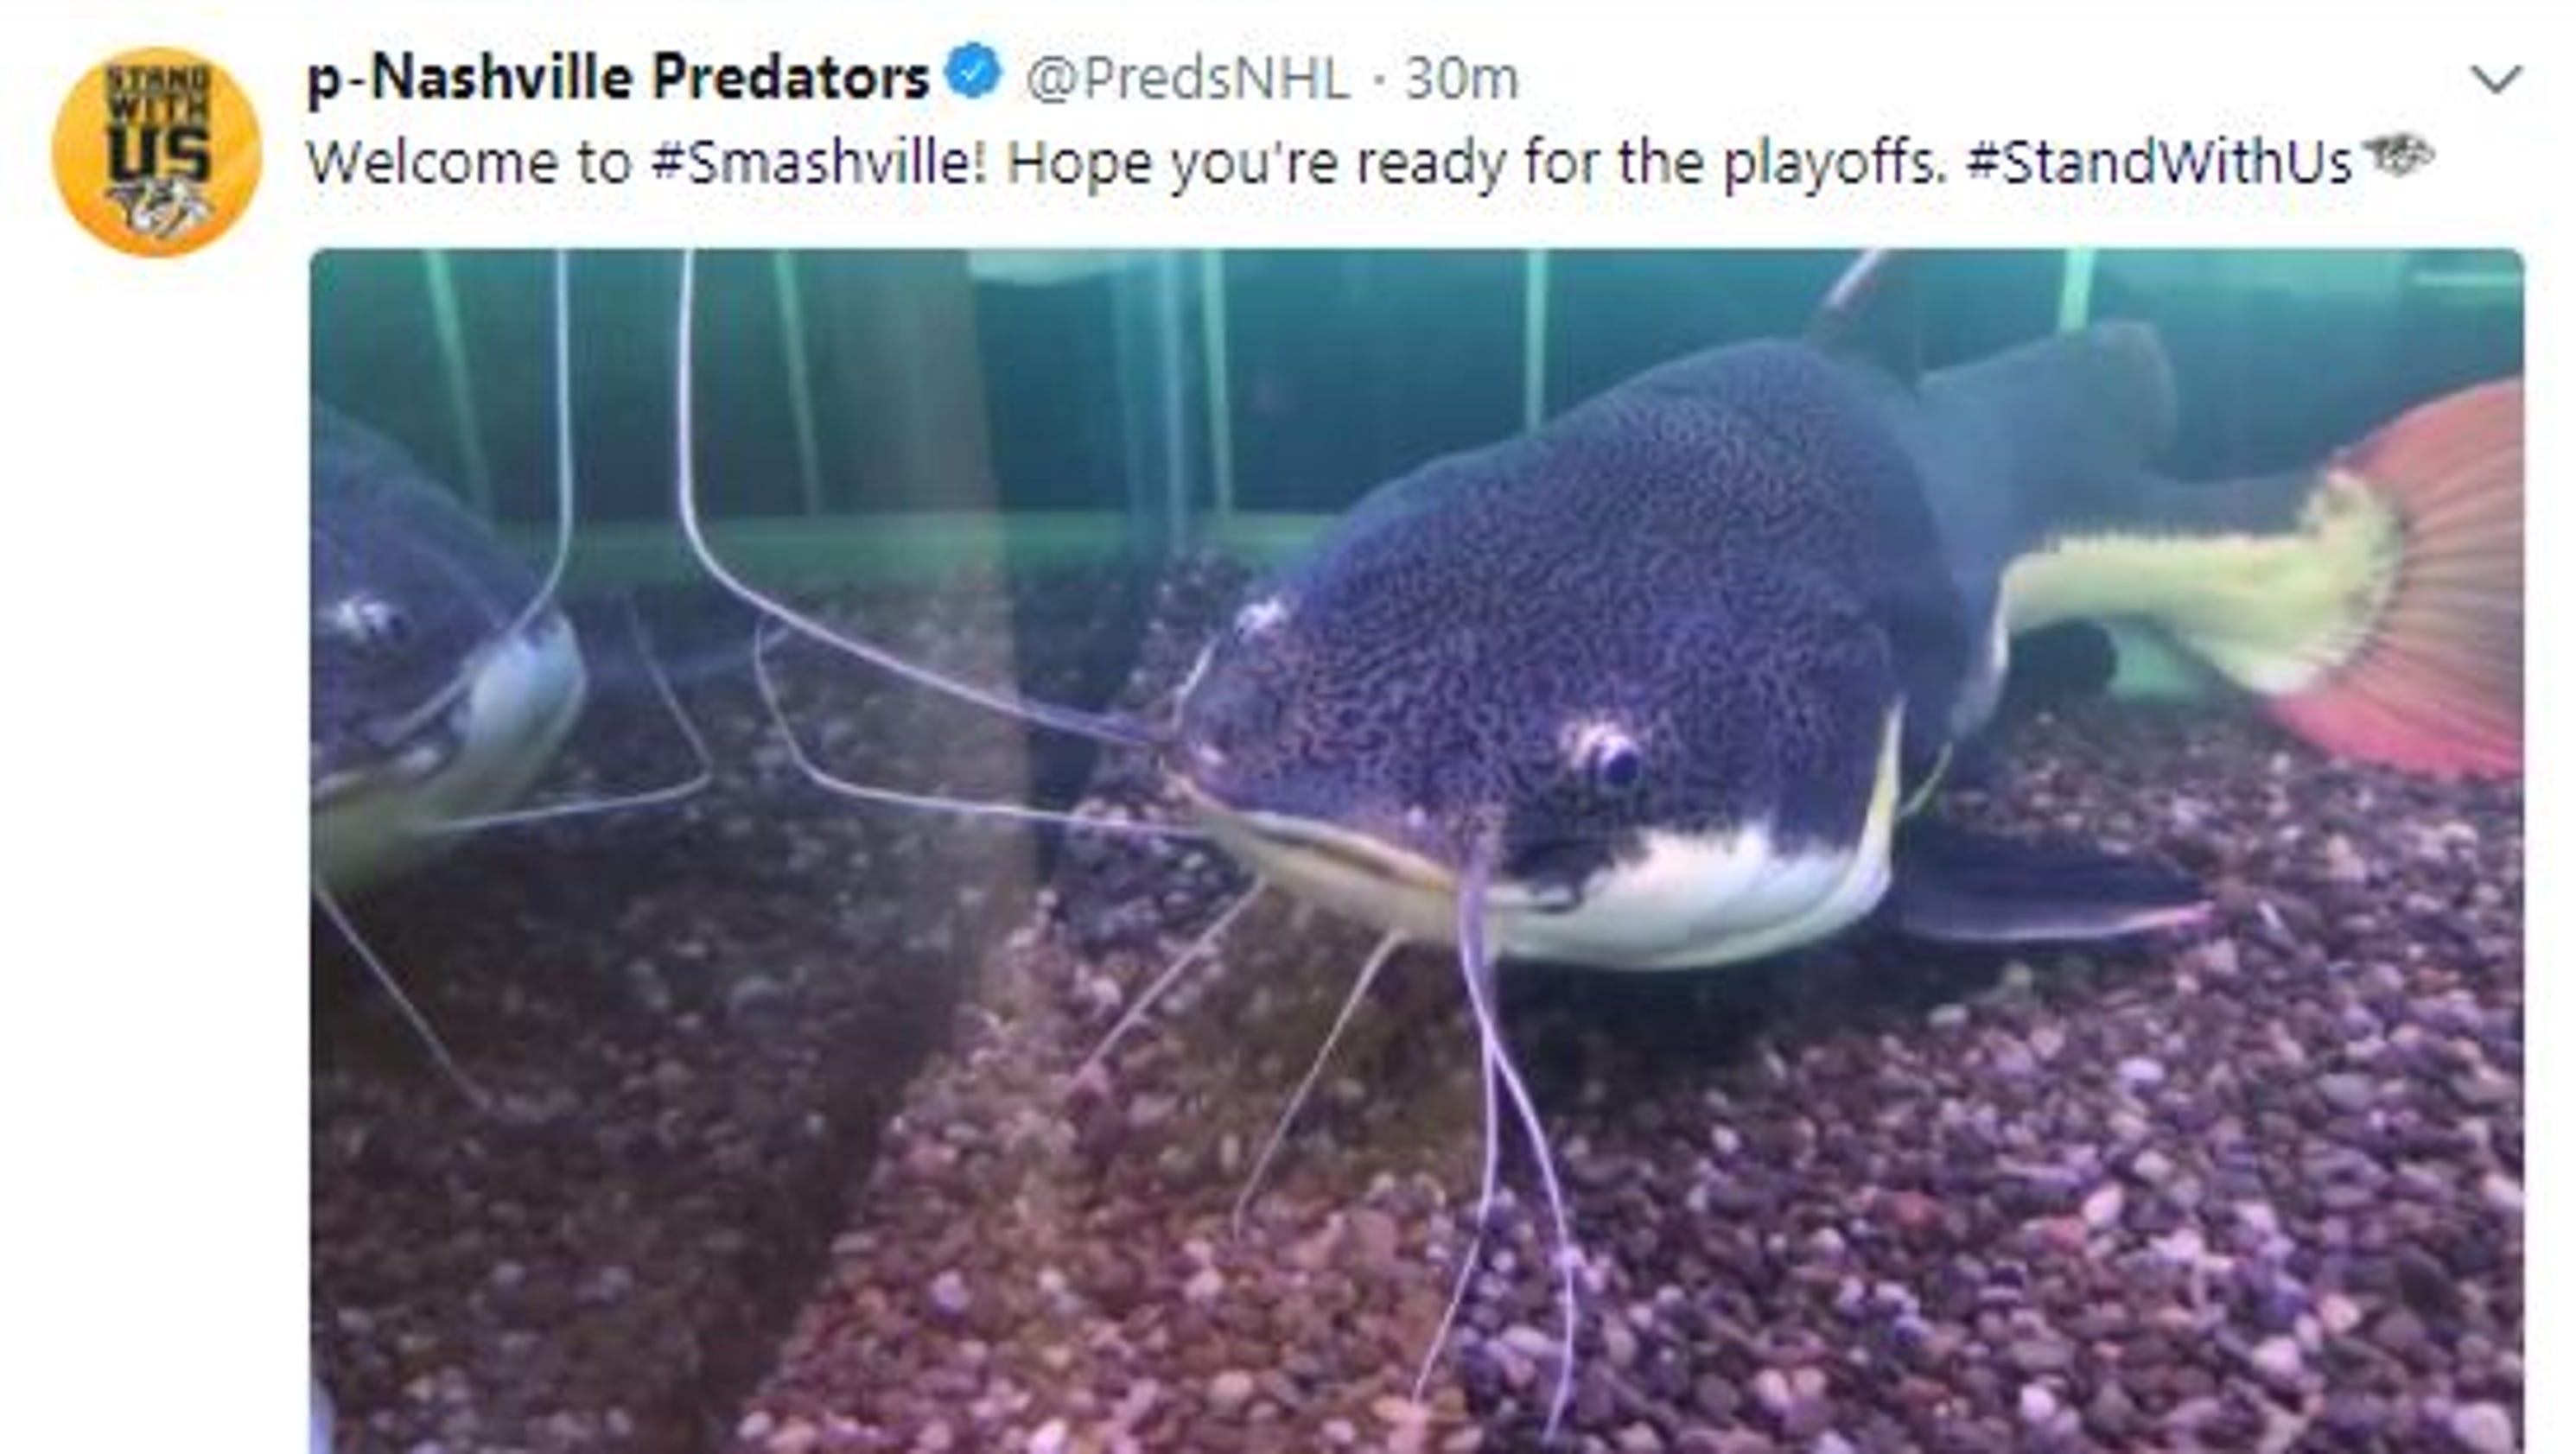 Predators catfish fish tank for NHL playoffs That s so Smashville